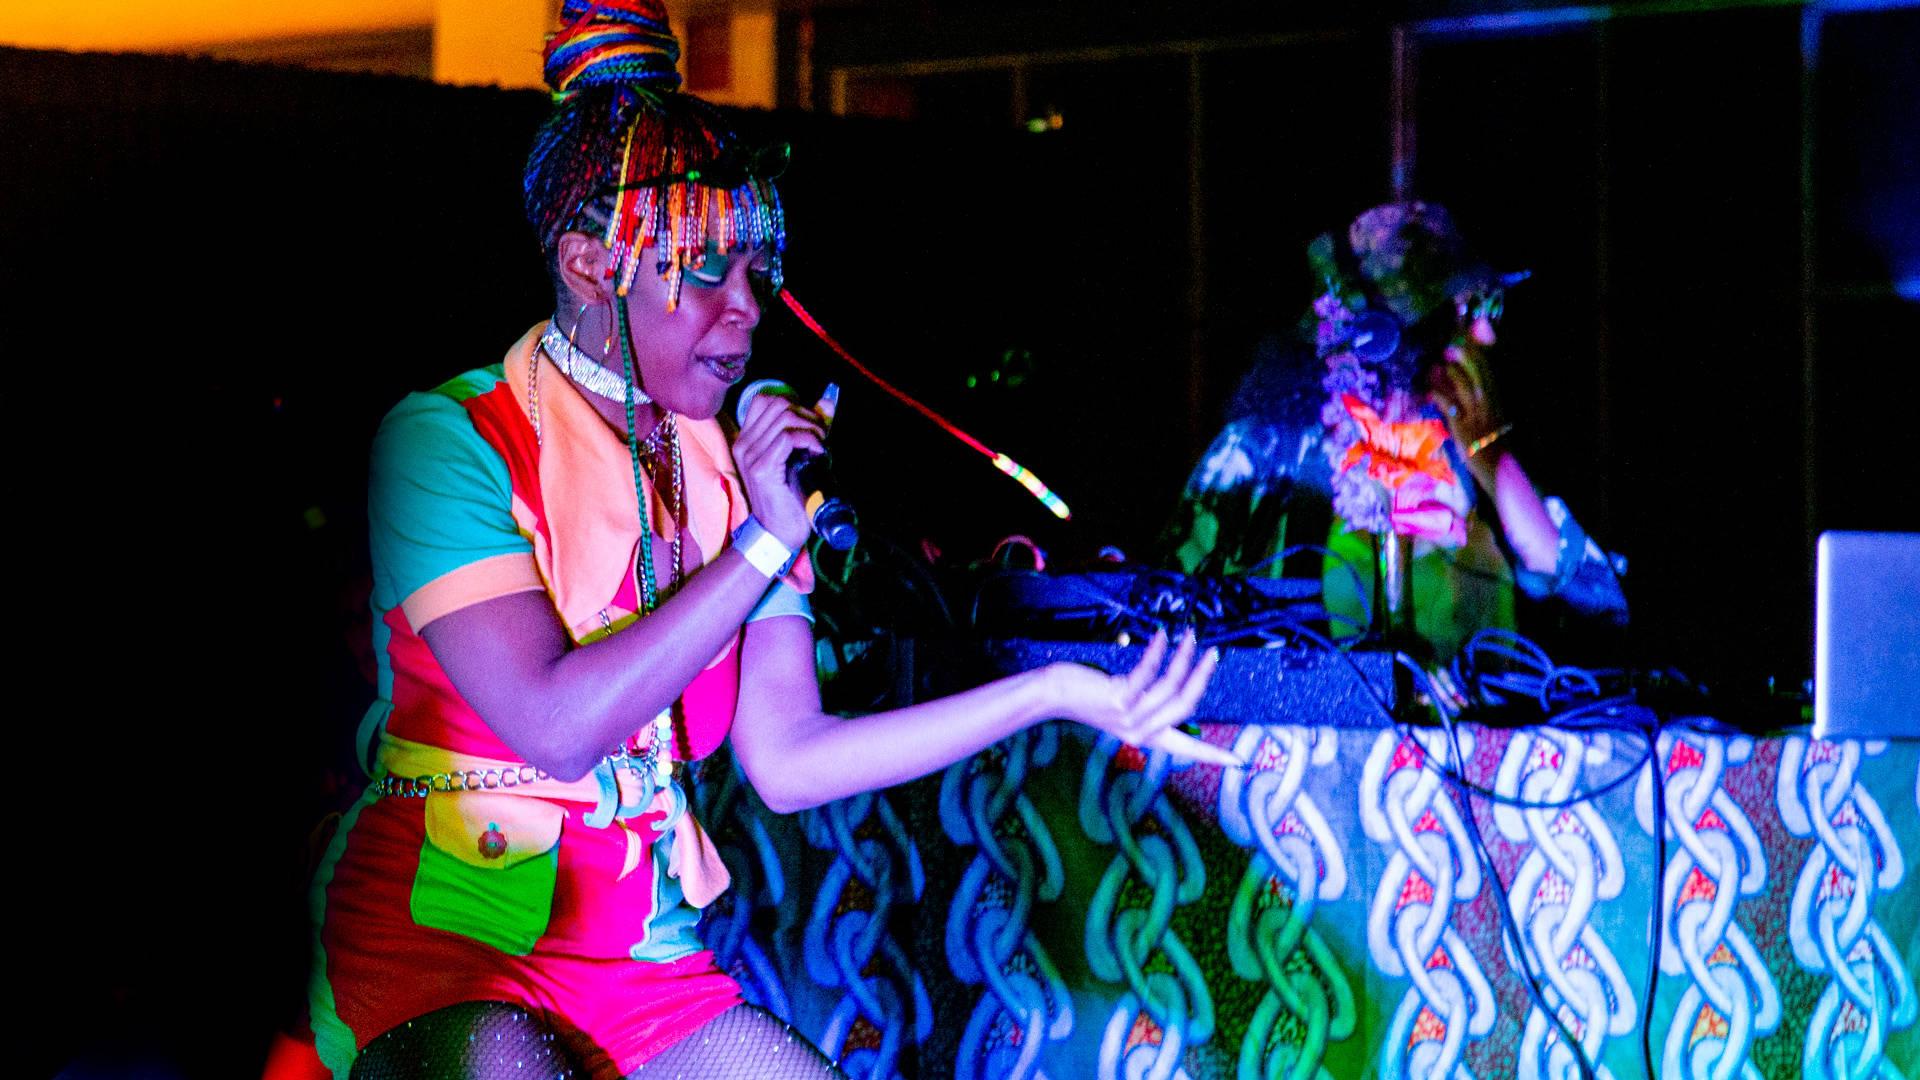 Bbymutha plays FEELS 6 at The Craneway Pavilion in Richmond on Saturday, June 16. (Estefany Gonzalez)